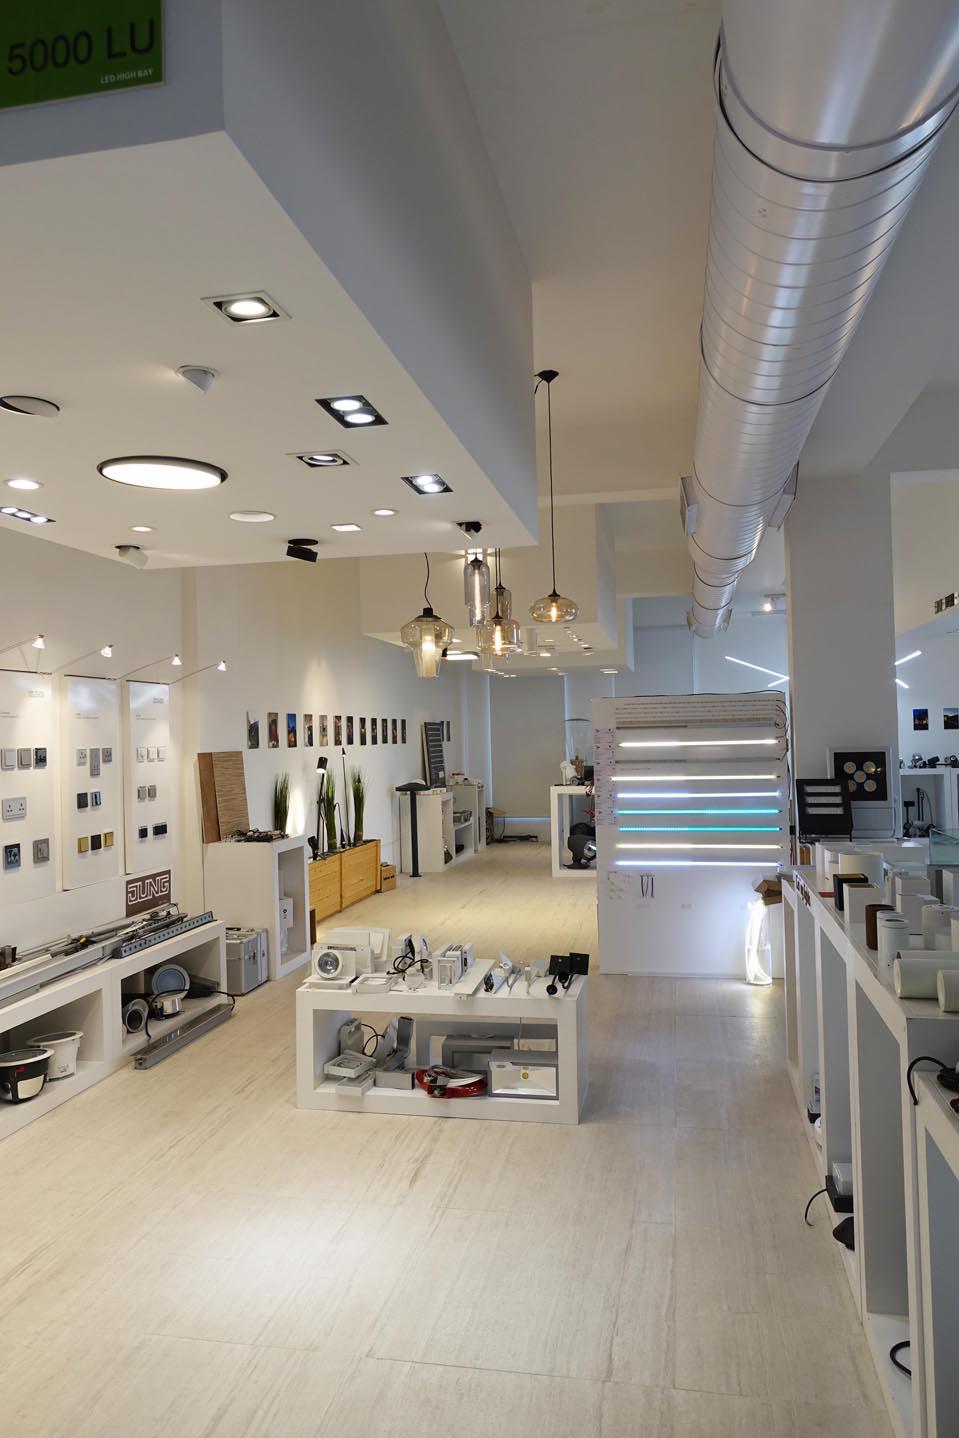 Top led lights in GCC